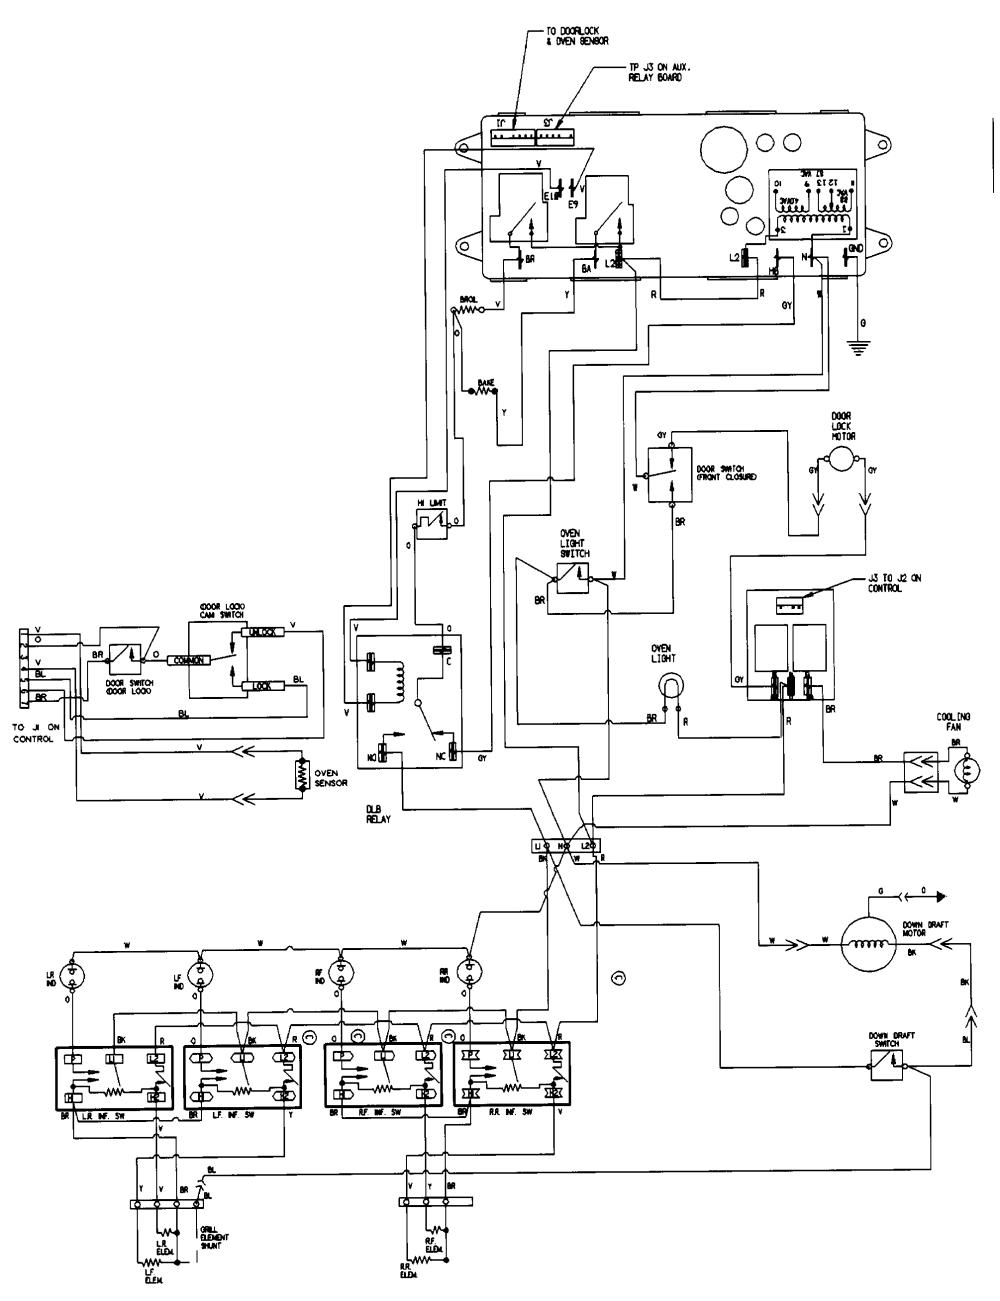 medium resolution of maytag oven wiring wiring diagrammaytag gas dryer wiring diagram additionally maytag dryer timermaytag pyg2300aww timer wiring